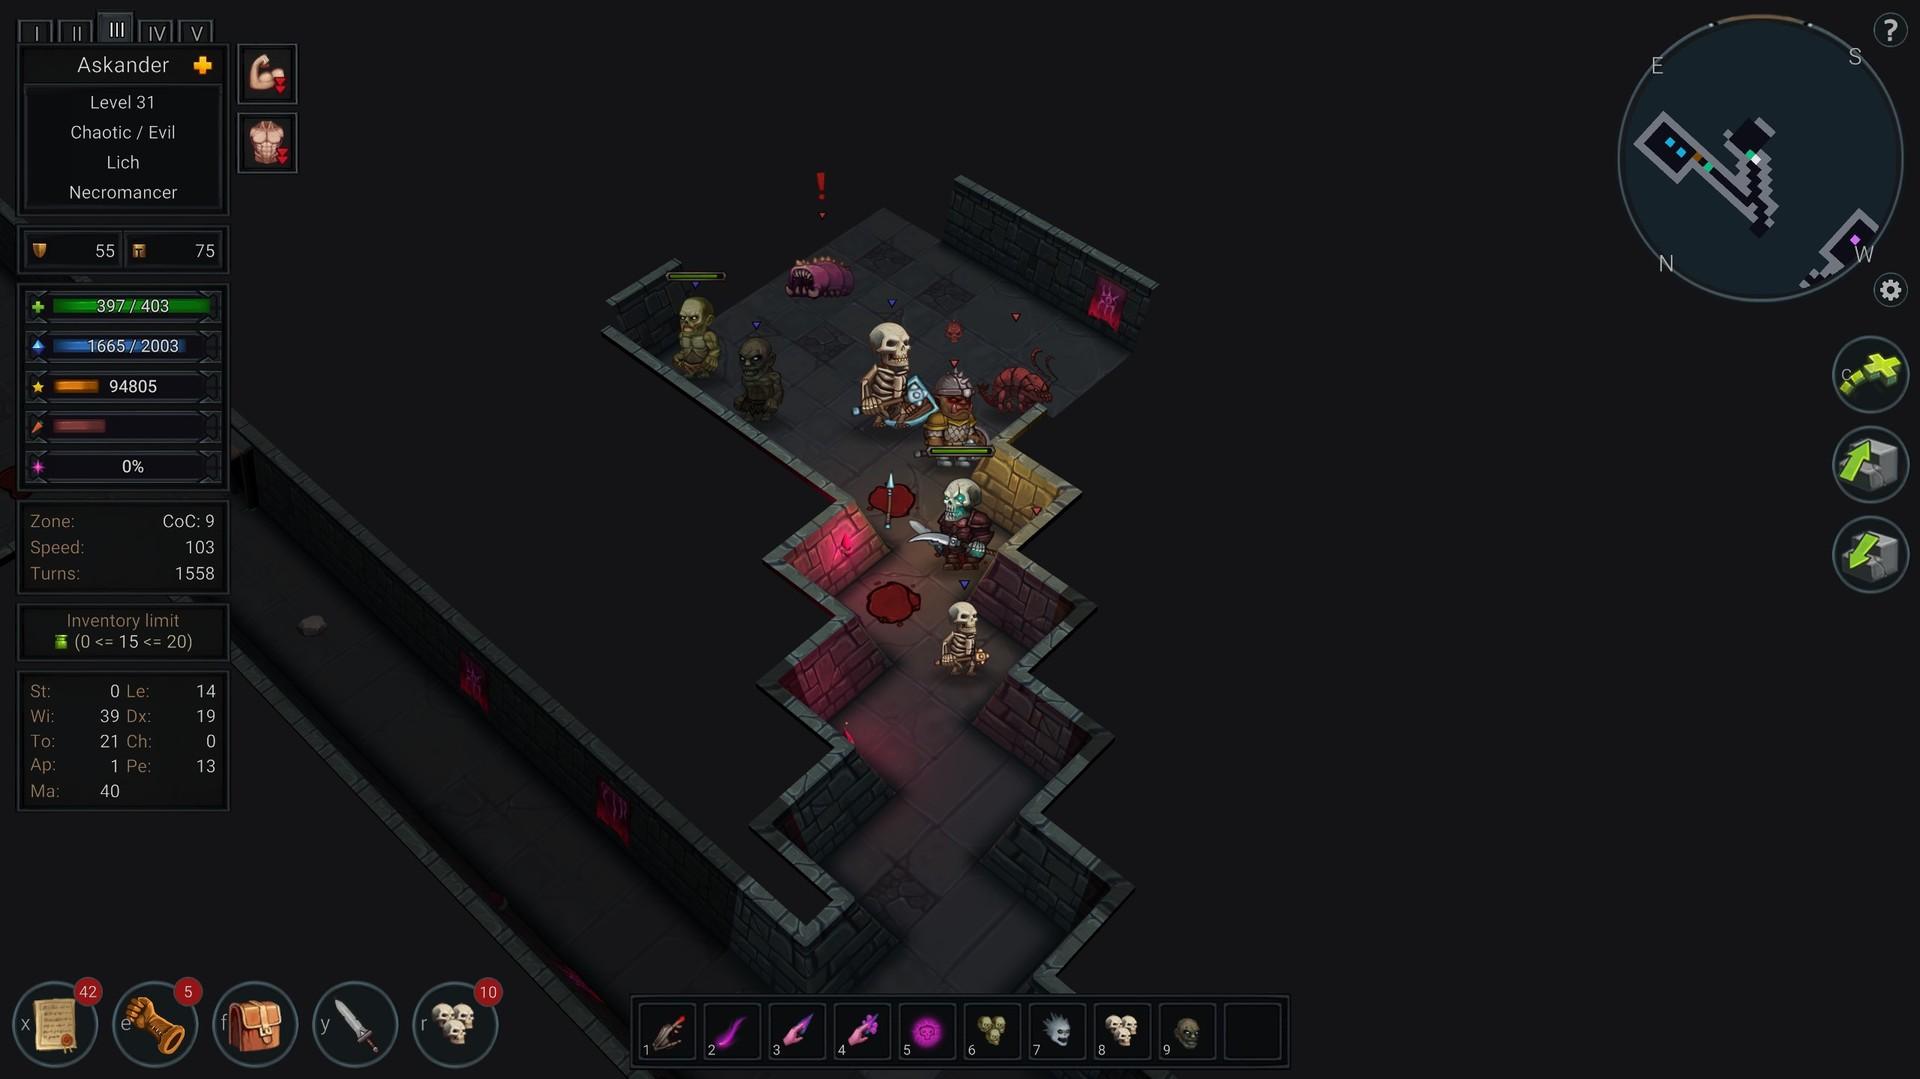 ultimate-adom-caverns-of-chaos-pc-screenshot-2